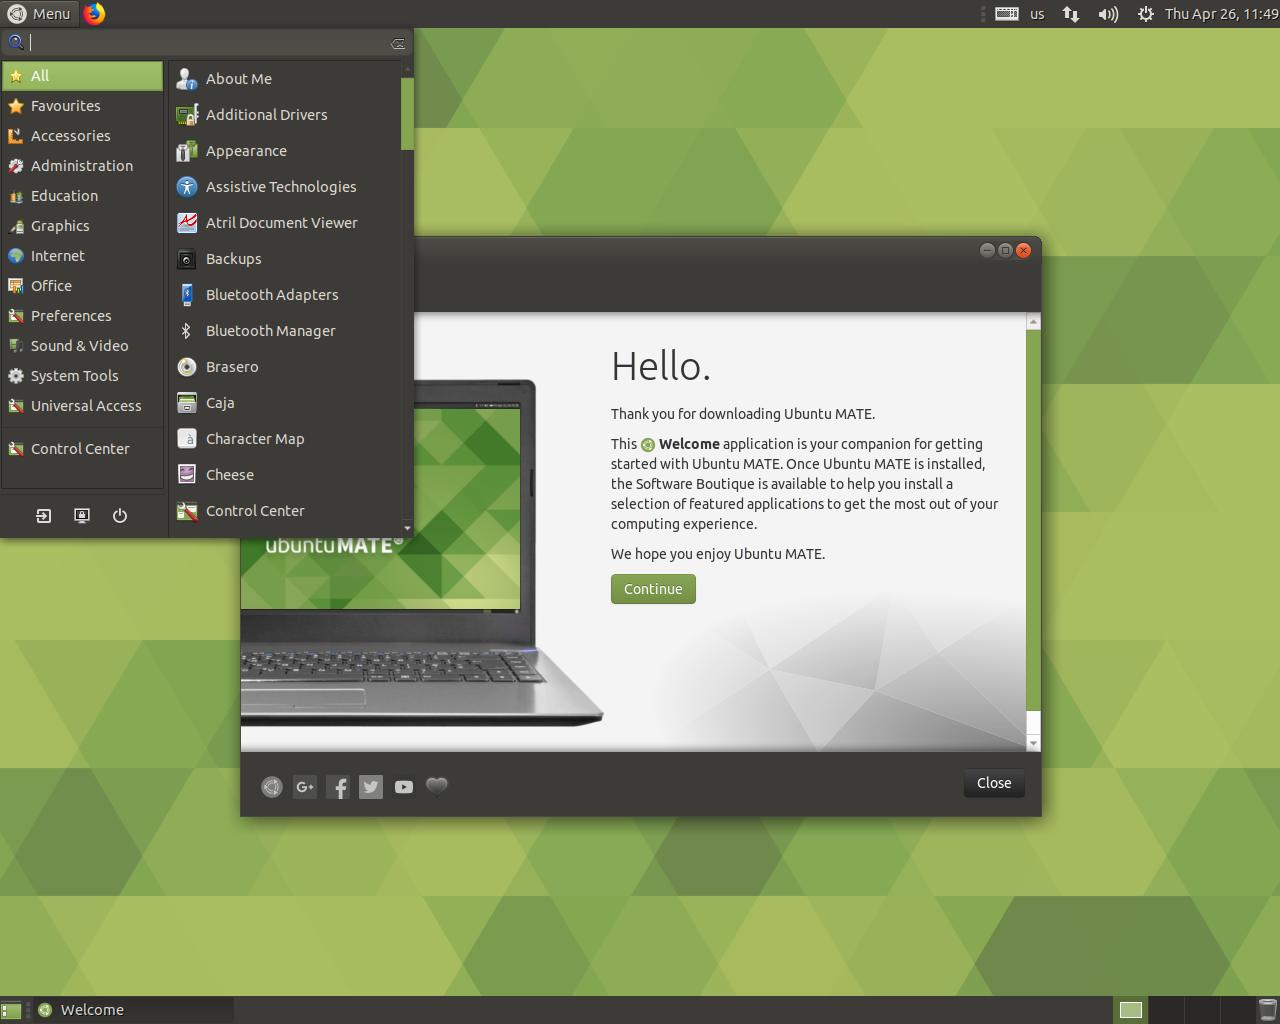 ubuntu mate � tuxnewsit